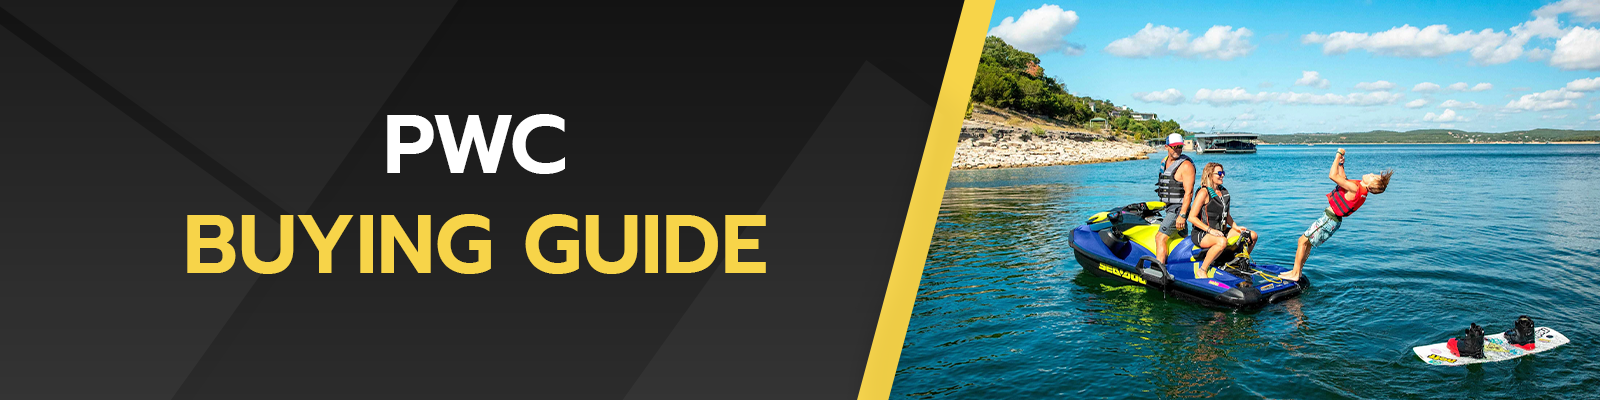 pwc buying guide